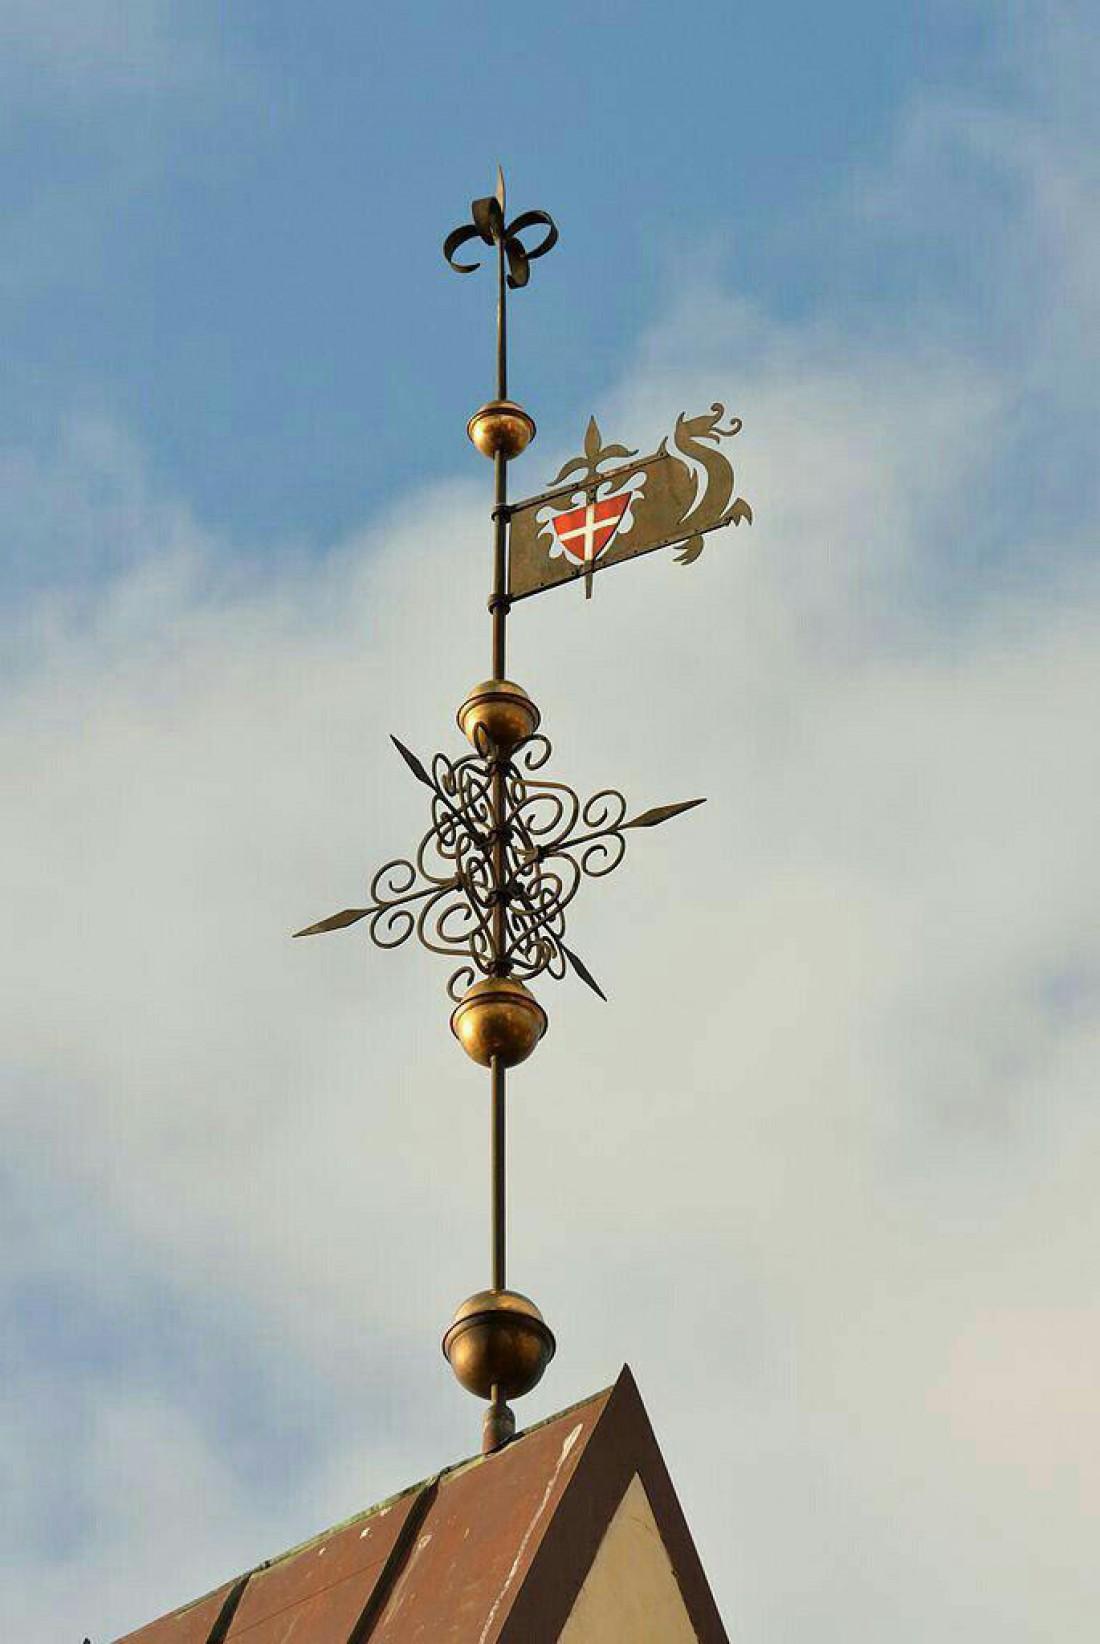 Флюгер Таллинской Ратуши Старый Томас